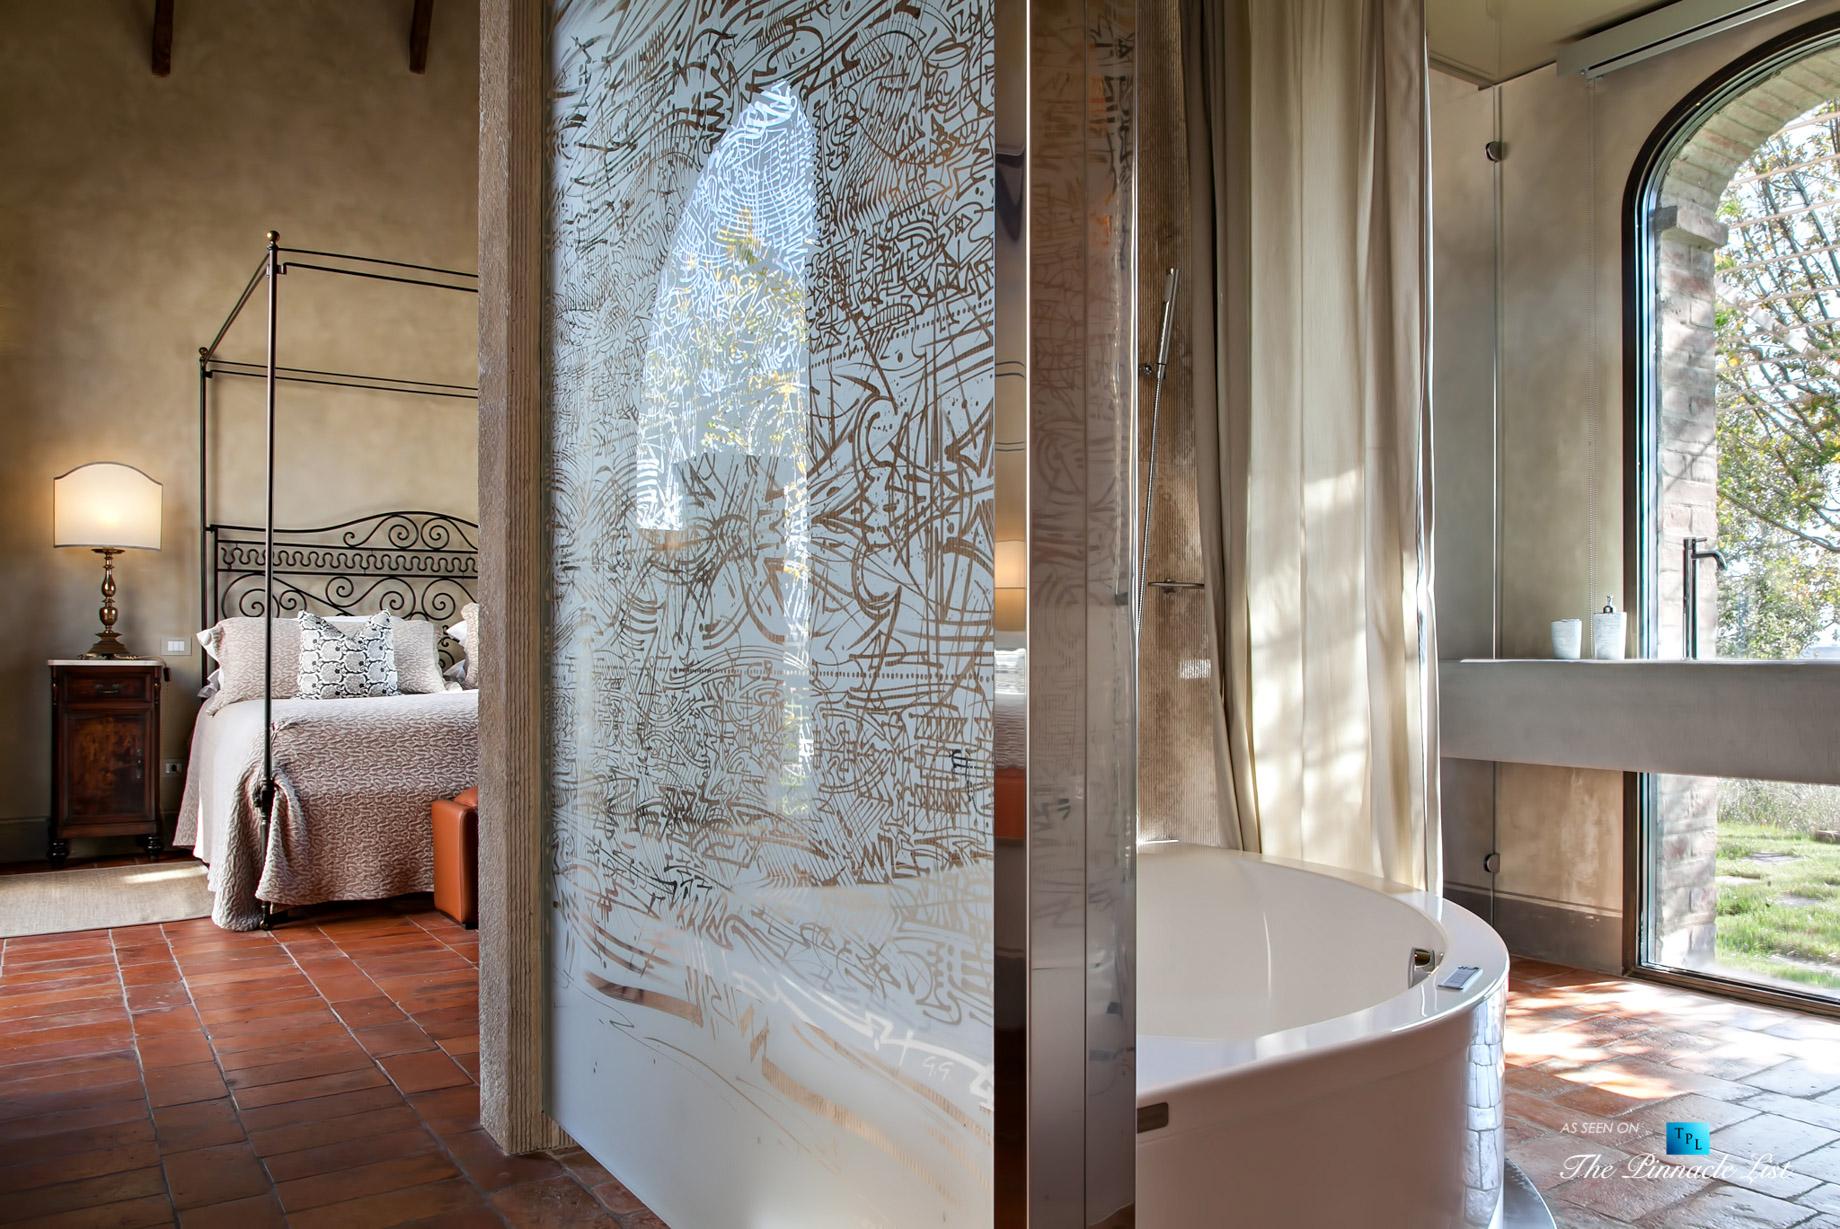 aHistoric Tuscan Villa – Podere Panico Estate, Monteroni d'Arbia, Siena, Tuscany, Italy – Master Bathroom